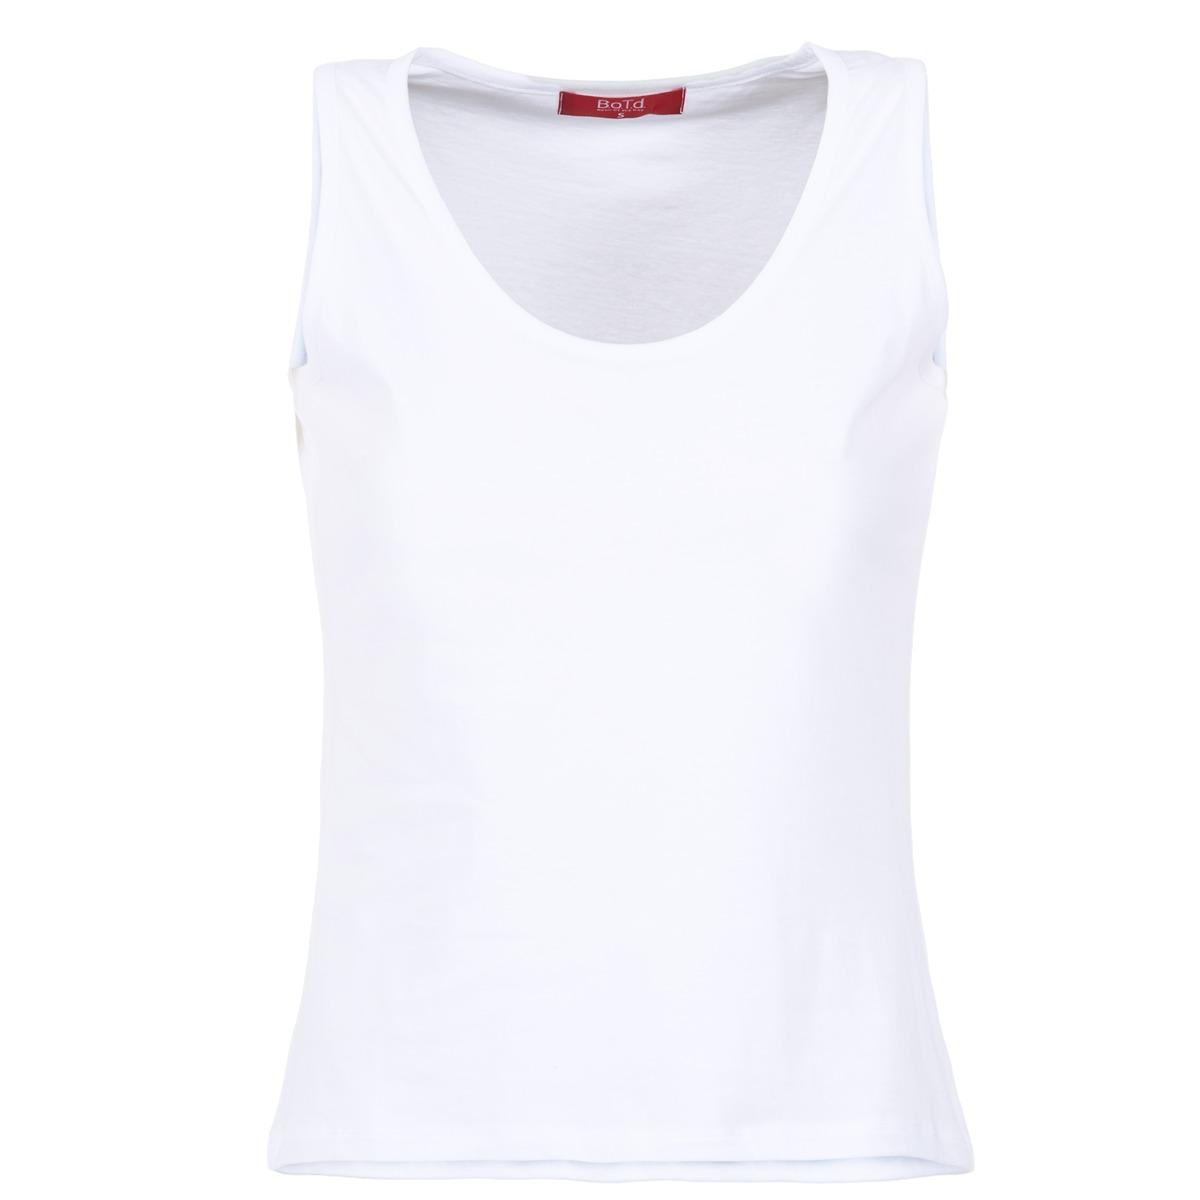 Toppe / T-shirts uden ærmer BOTD  EDEBALA